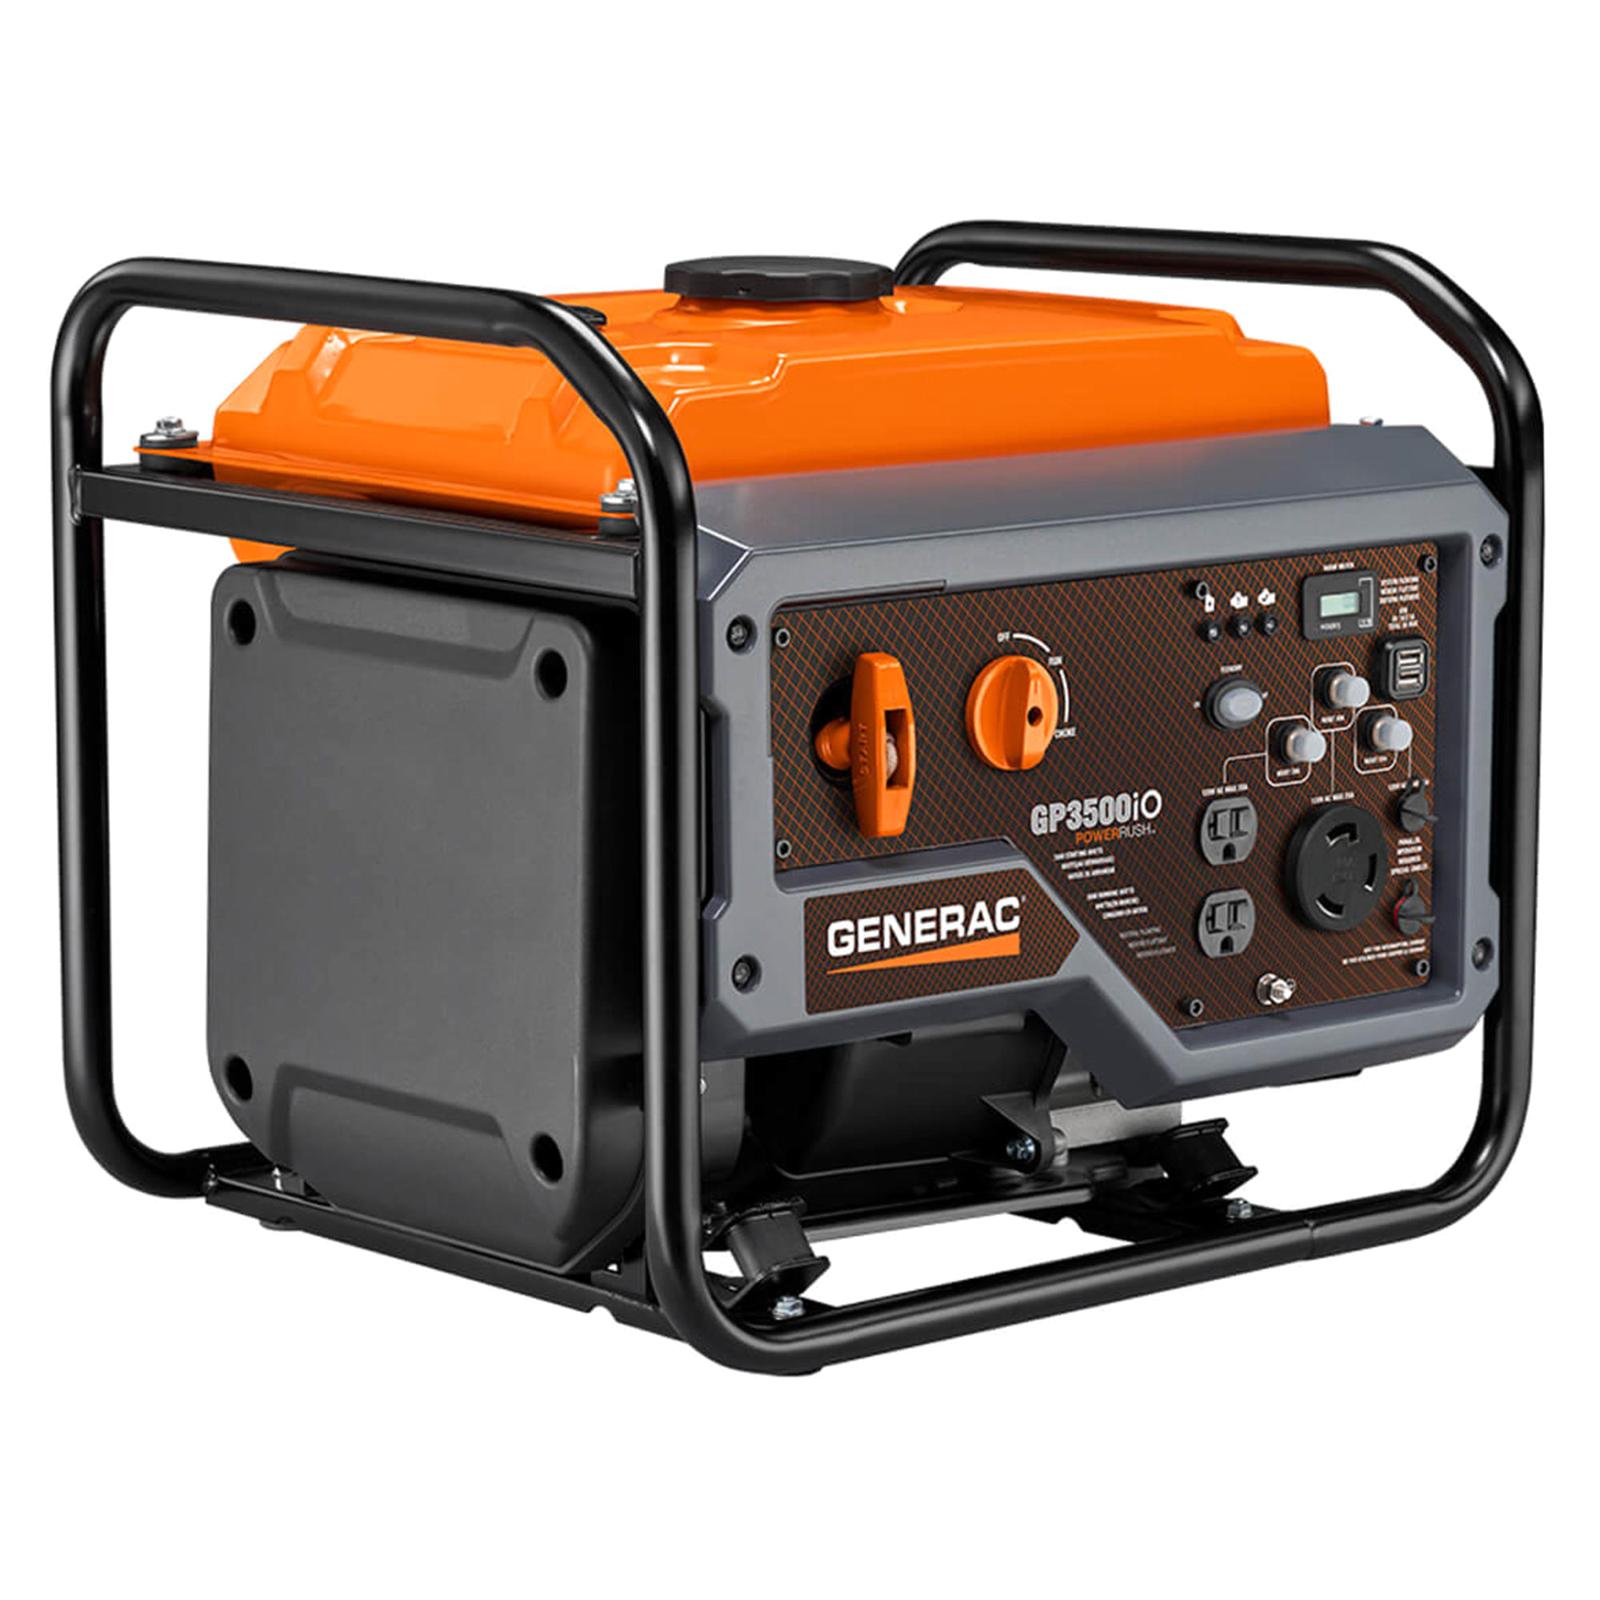 hight resolution of generac 7128 gp series 3500io 3500w portable generator with economy mode